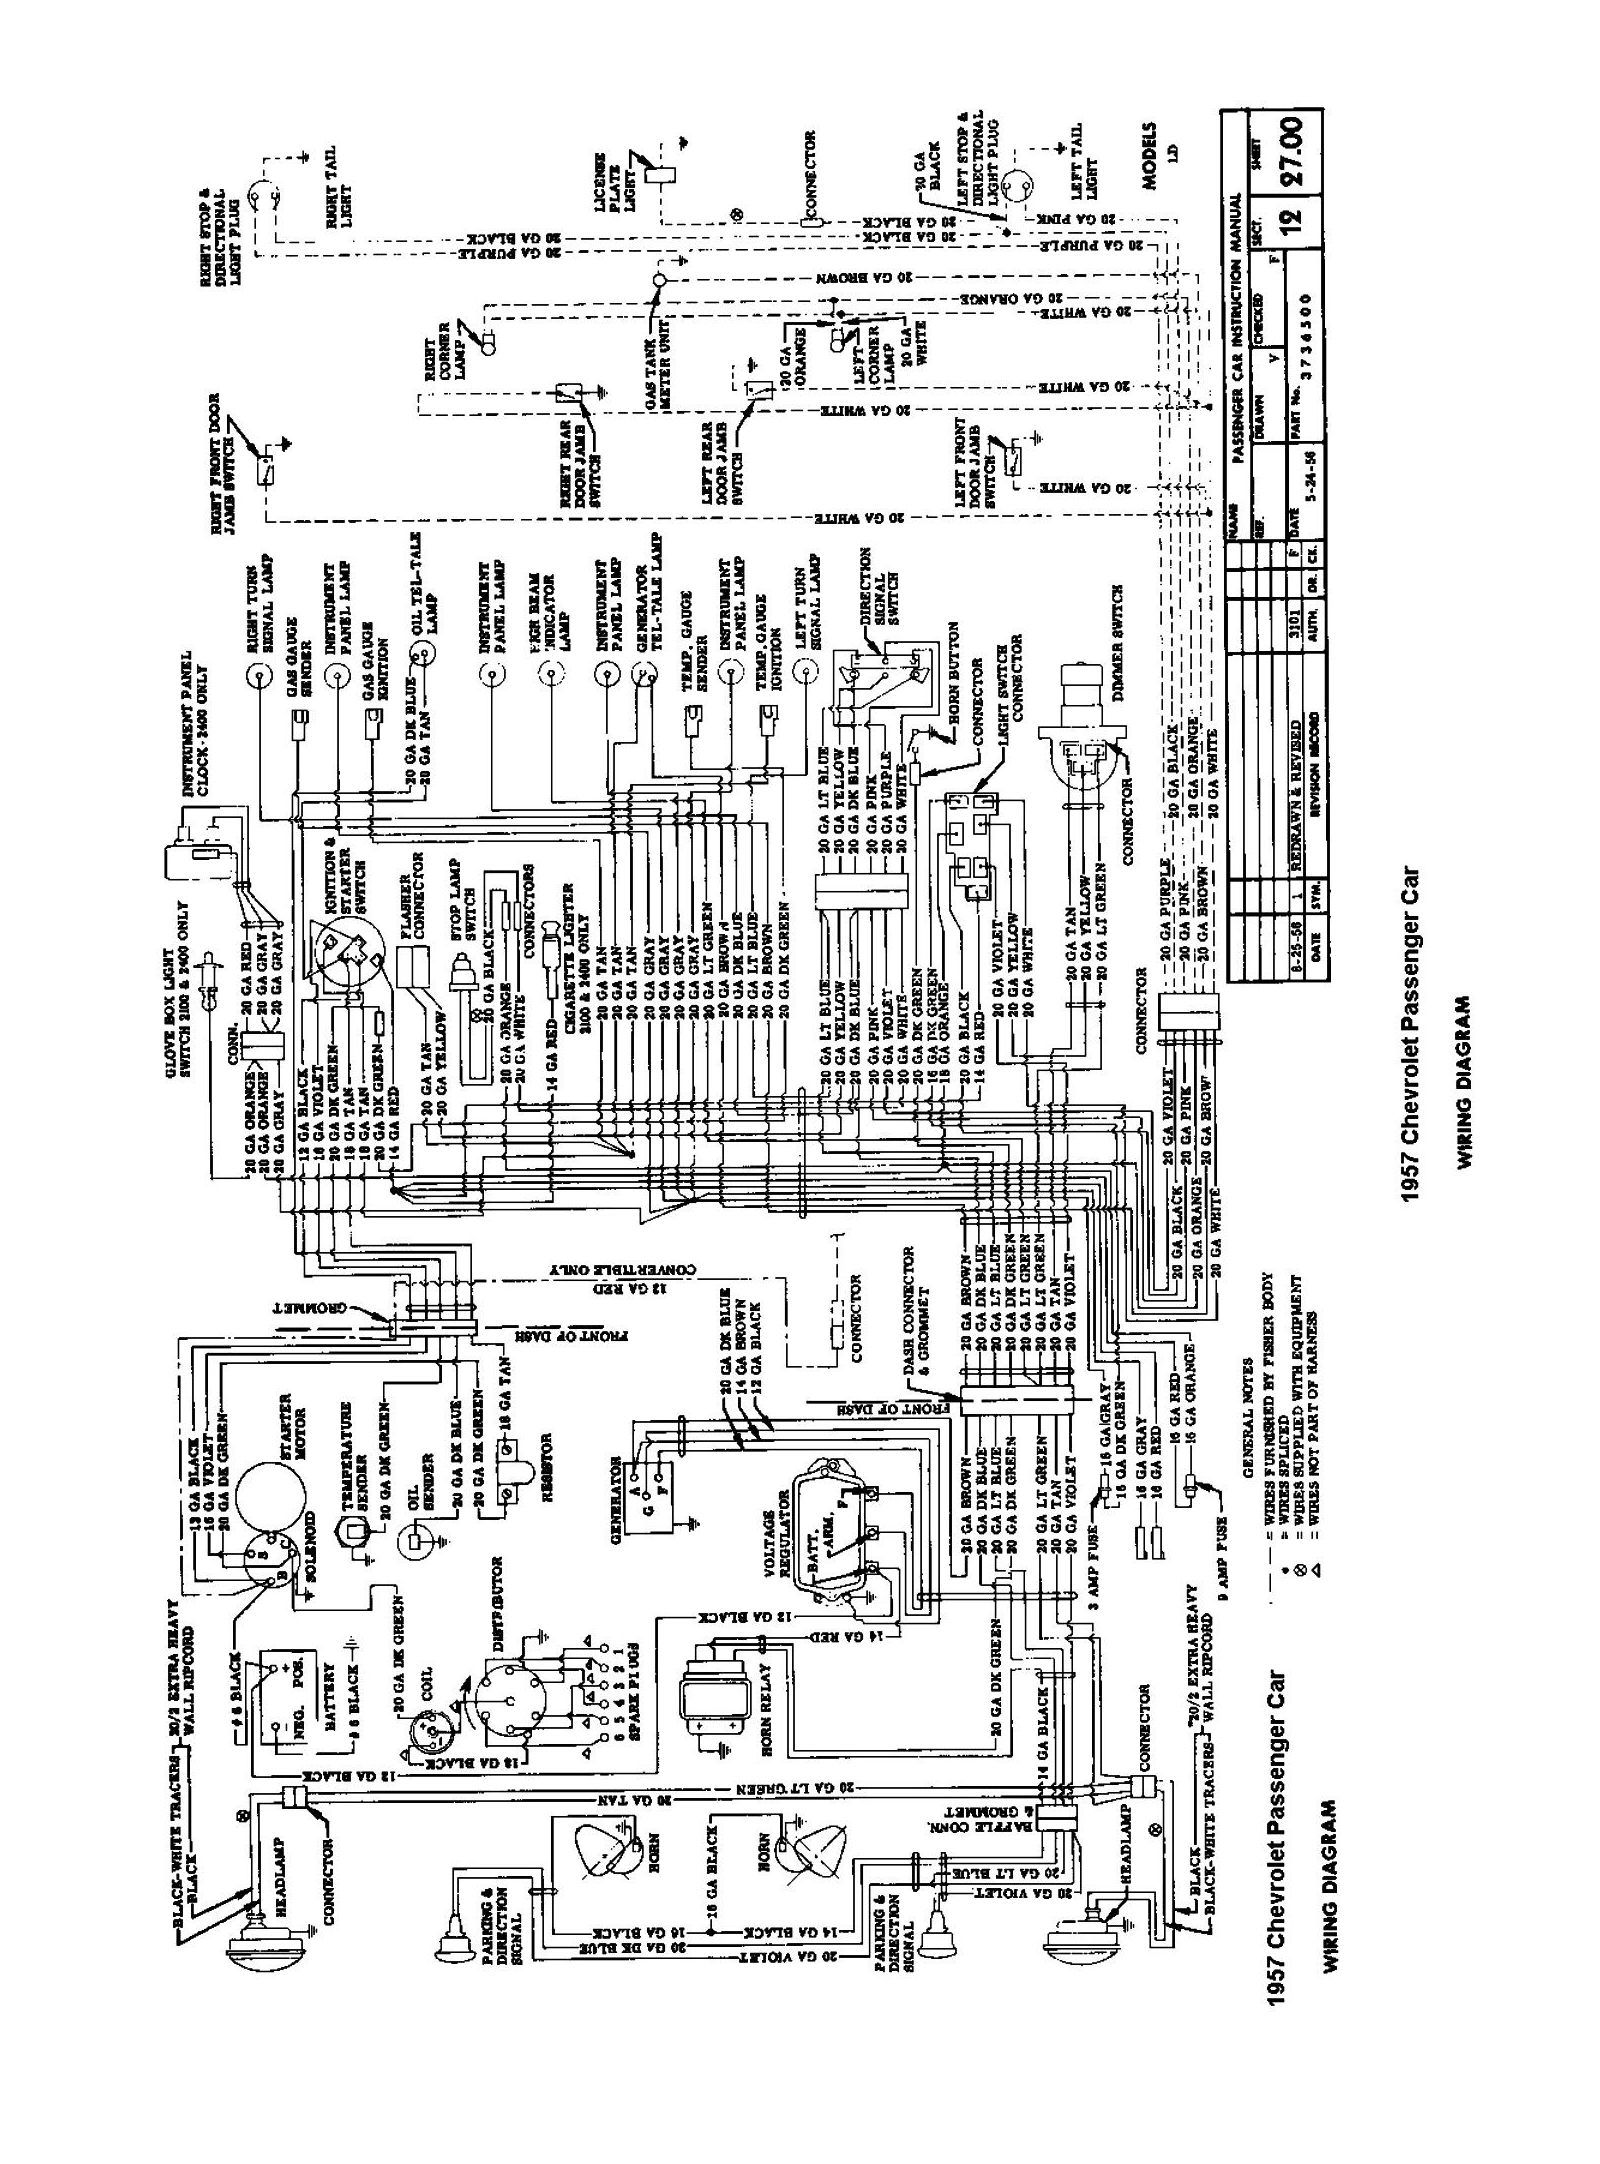 57 Chevy wiring diagram   57 chevys   Diagram, 1957